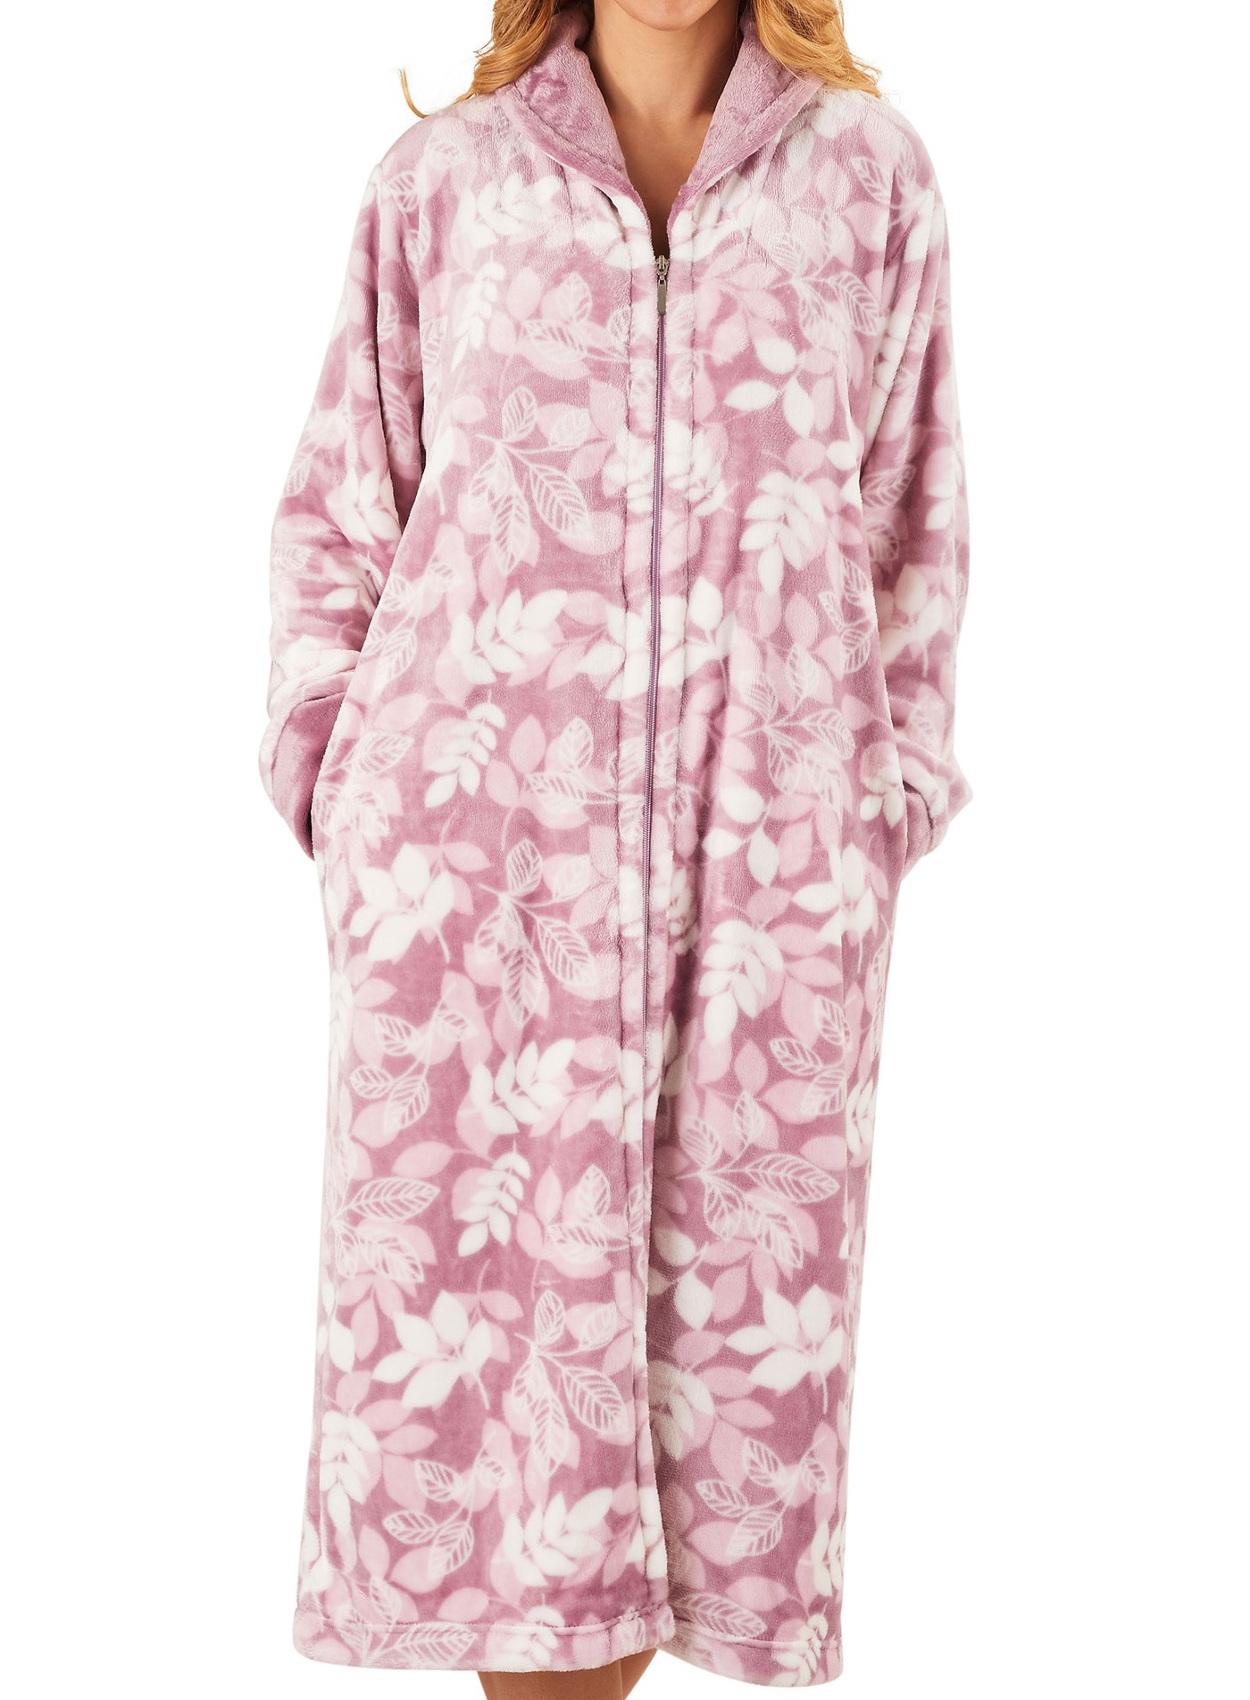 Dressing Gown Womens Leaf Pattern Zip Up Bathrobe